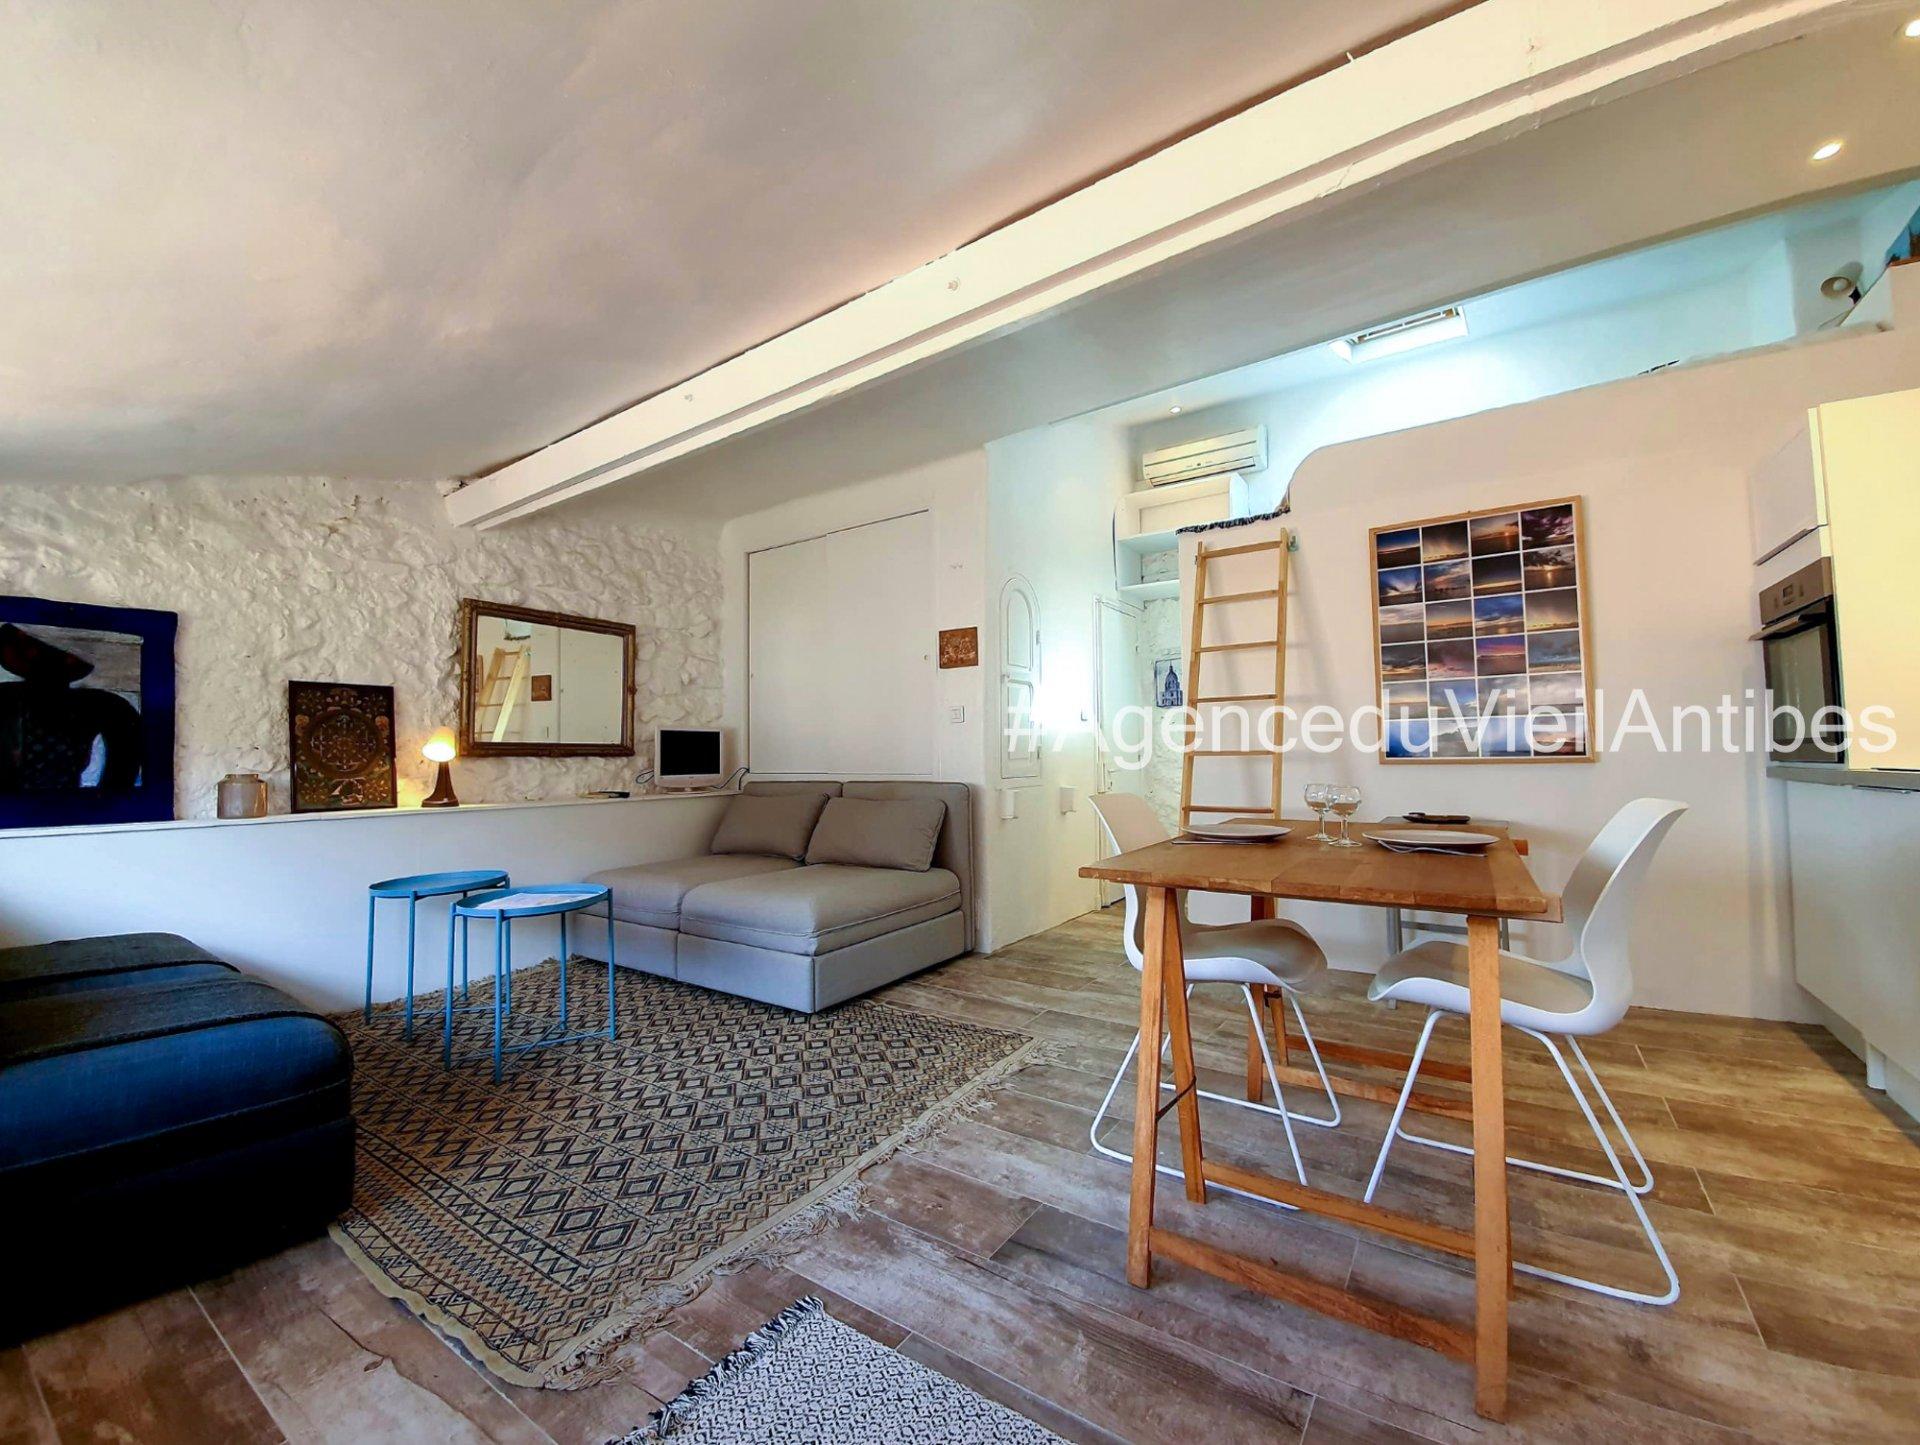 Vieil Antibes dernier étage studio de 26.69 m²